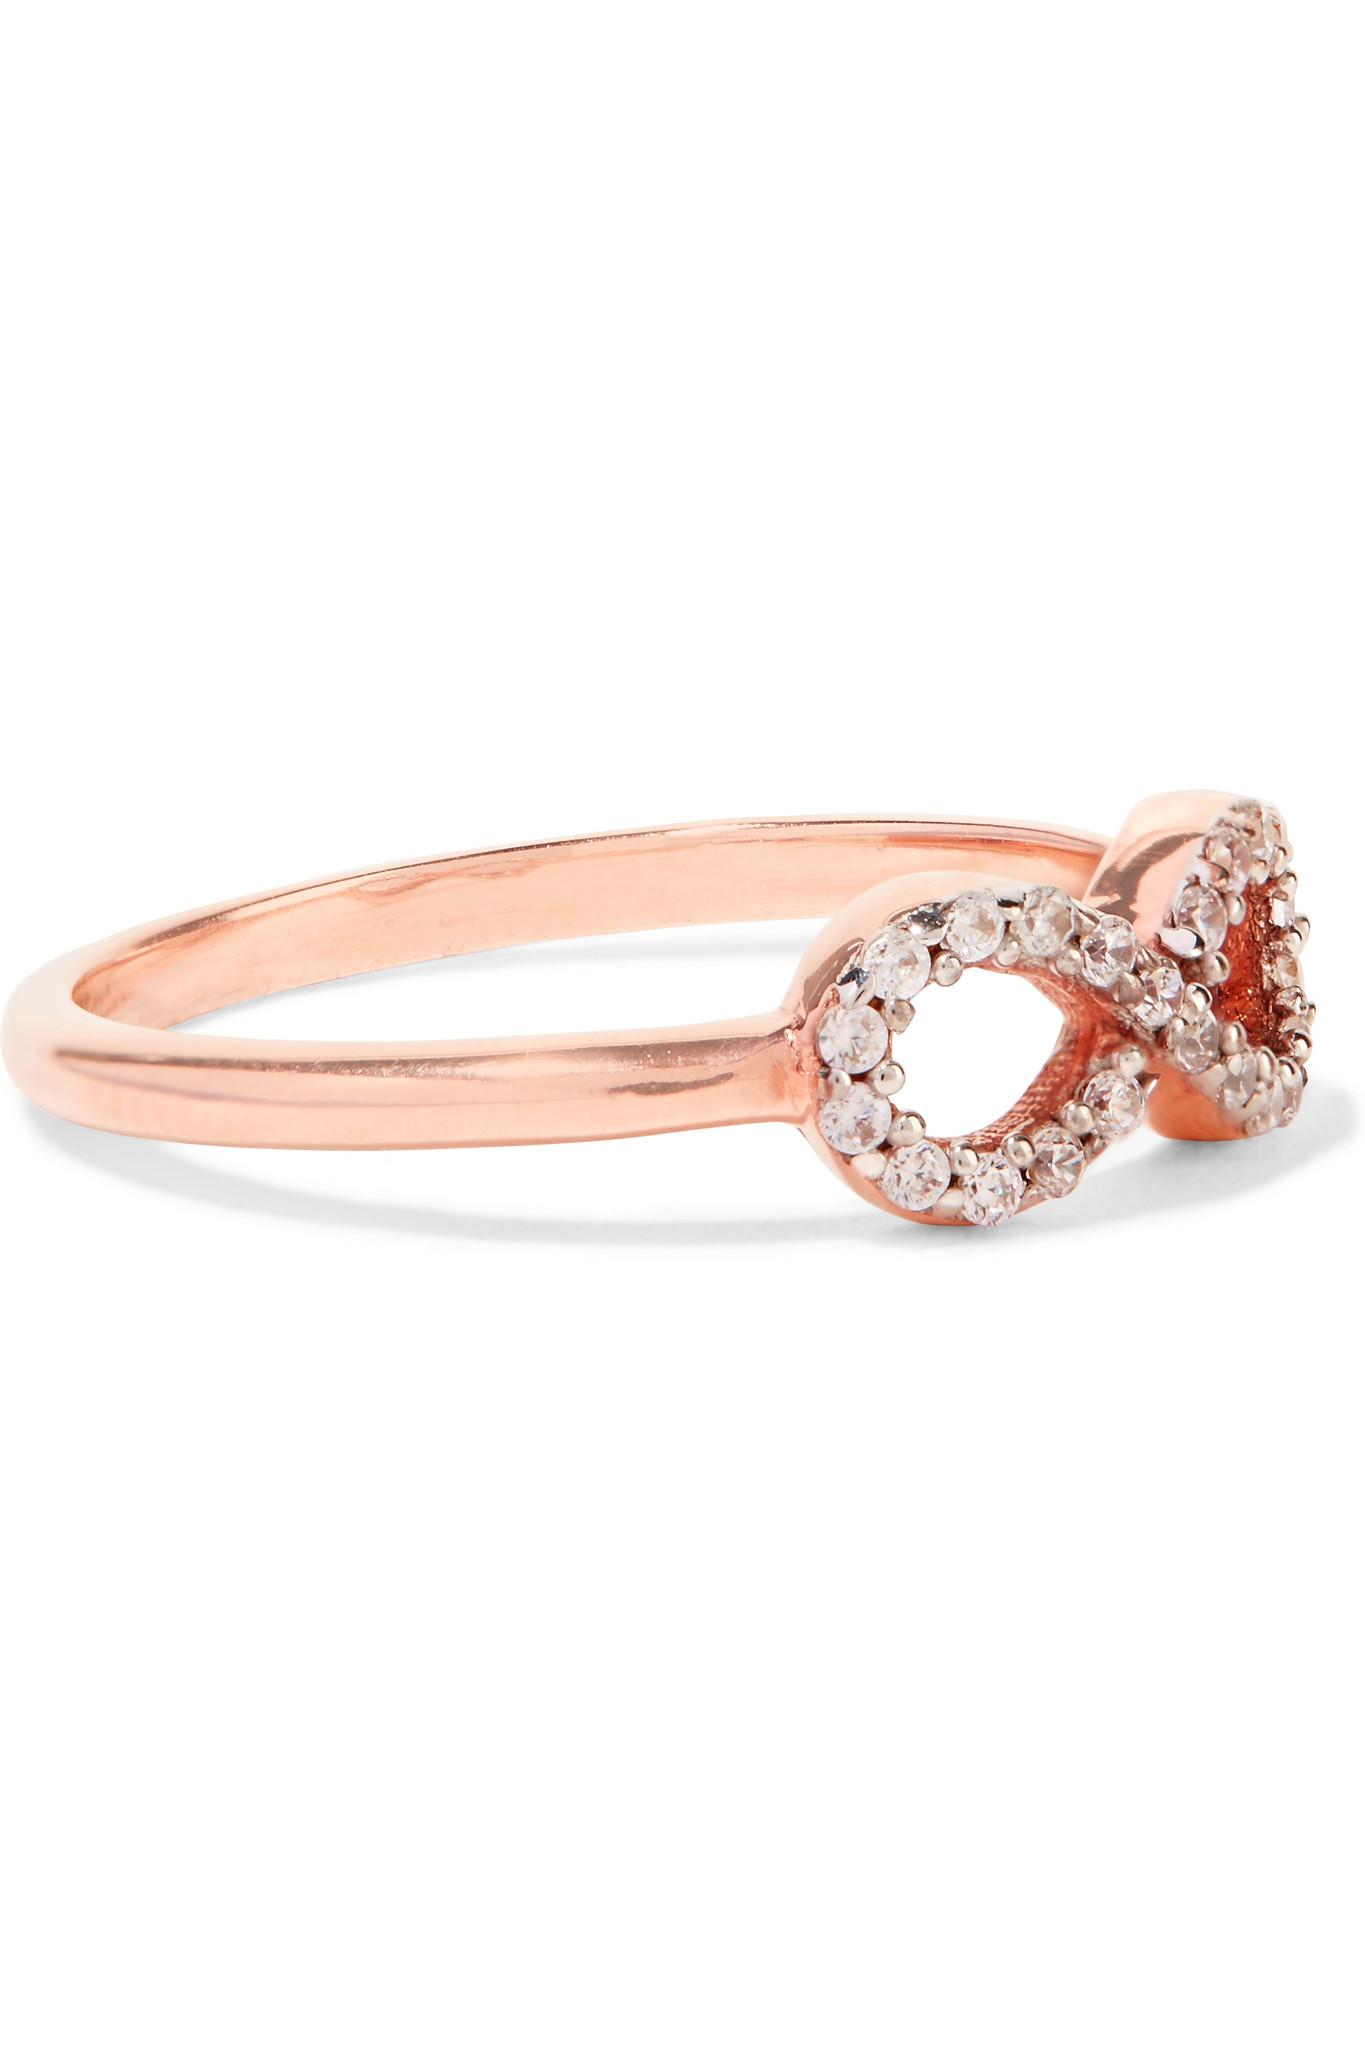 Aamaya By Priyanka Infinity Rose Gold-plated Topaz Ring in Pink